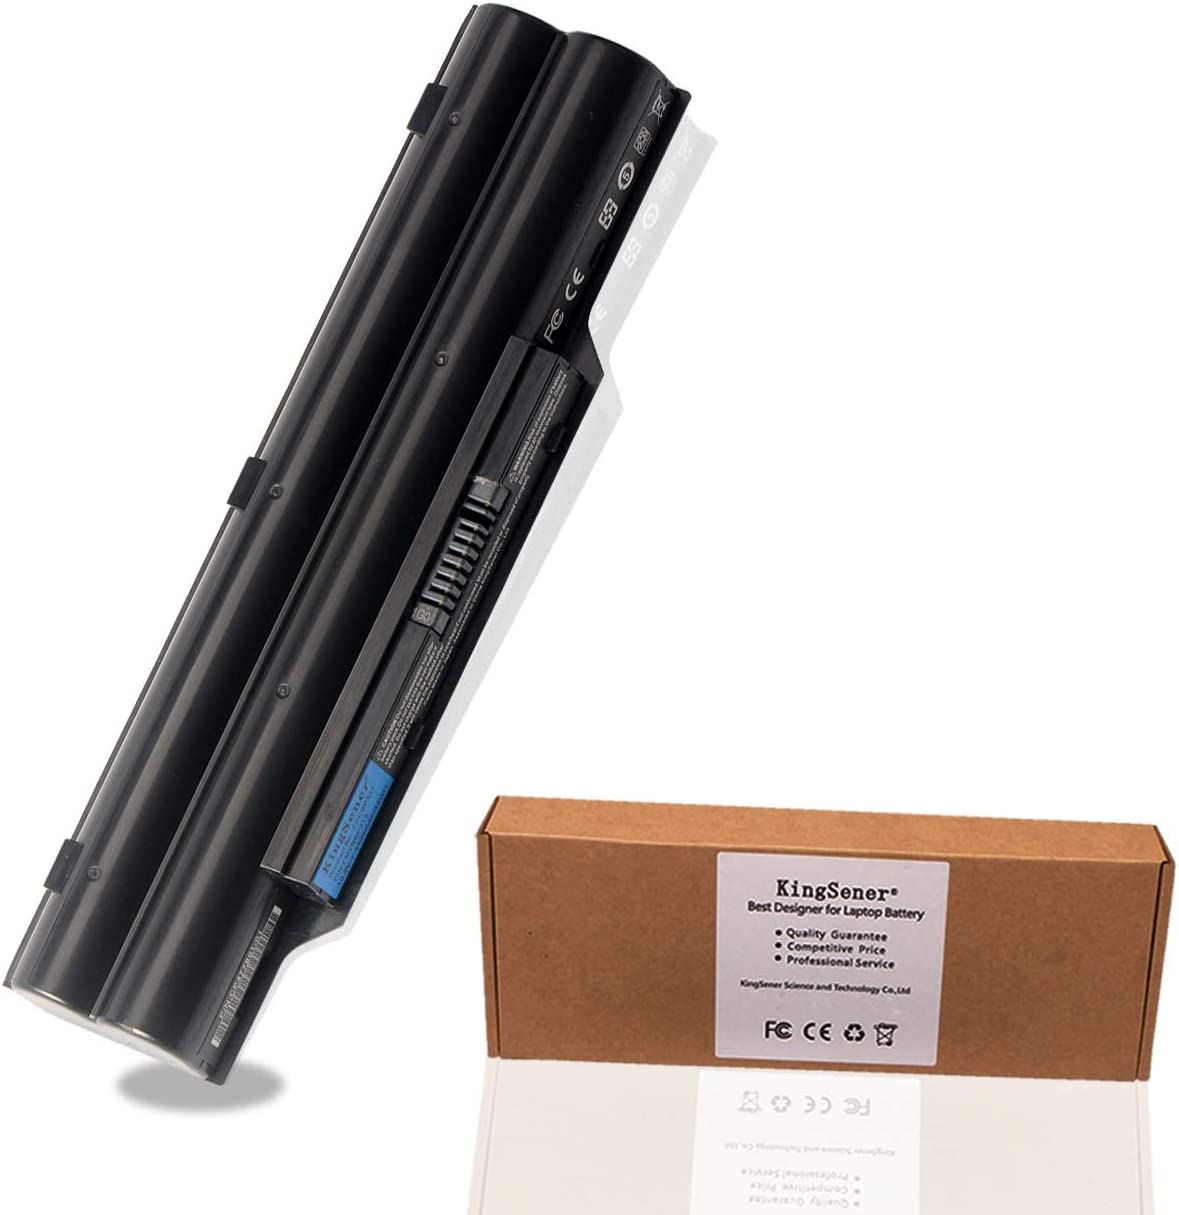 KingSener FPCBP331 Battery for Fujitsu LifeBook A532 AH512 AH532 AH532/GFX FPCBP331 FMVNBP213 FPCBP347AP 10.8V 4400mAh